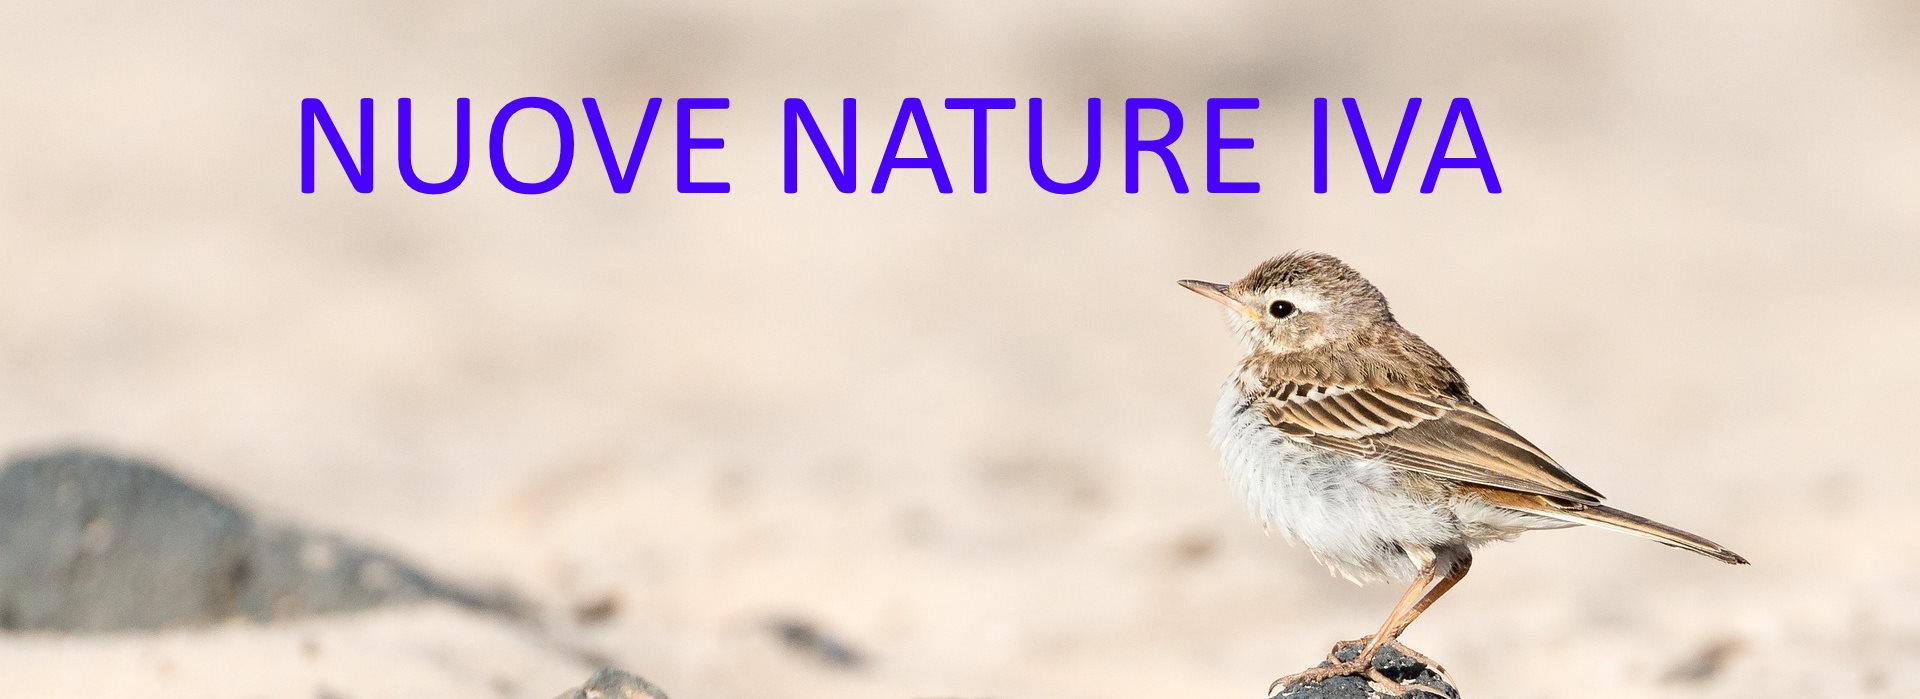 NATURE iva